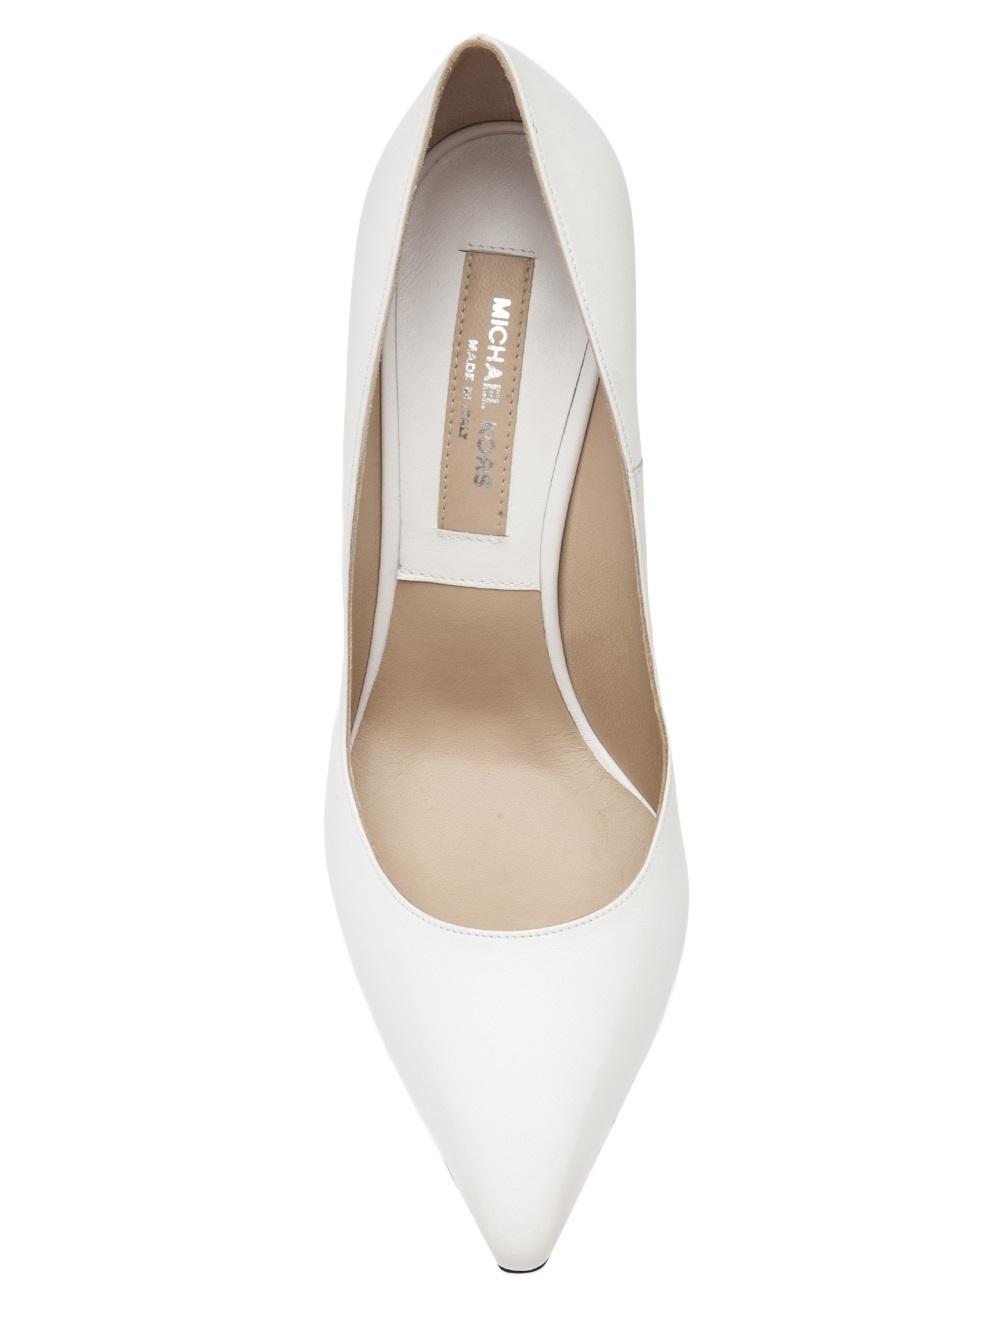 c6b951c6c66 ... Michael Kors Curved Heel Pump in White - Lyst ...